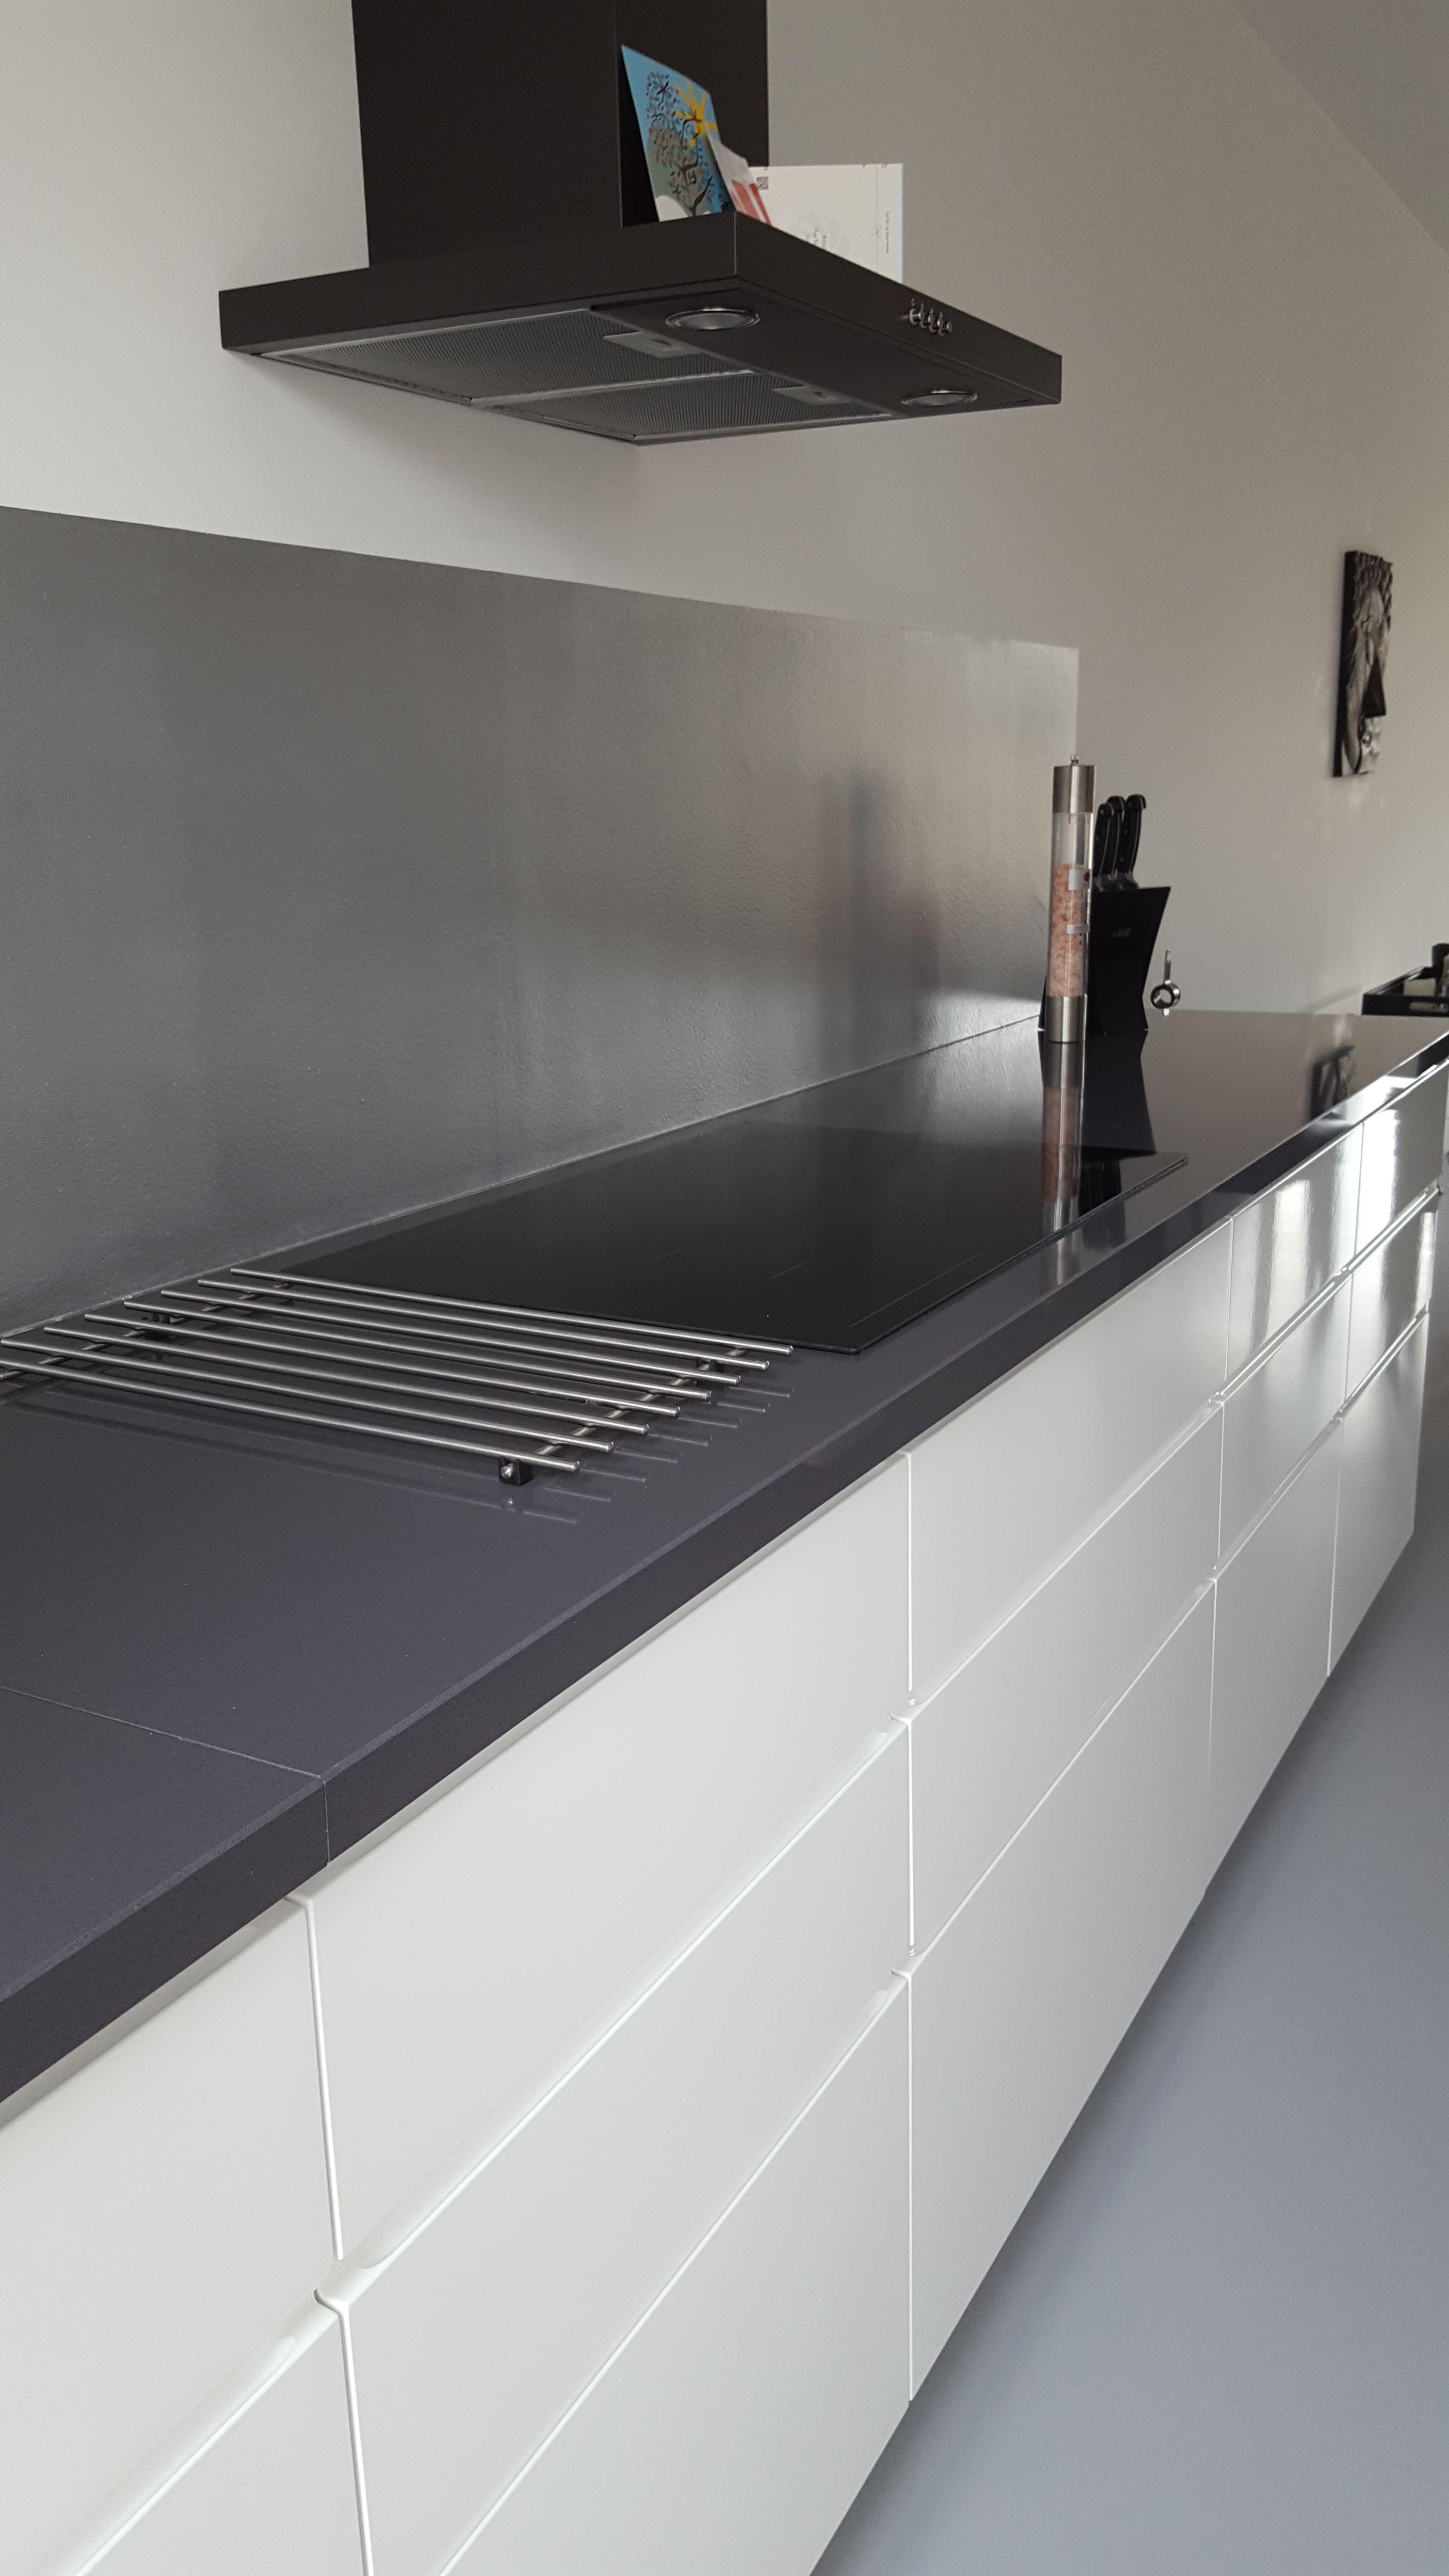 Genoeg Ikea Hoogglans Keuken Vxp18 Agneswamu